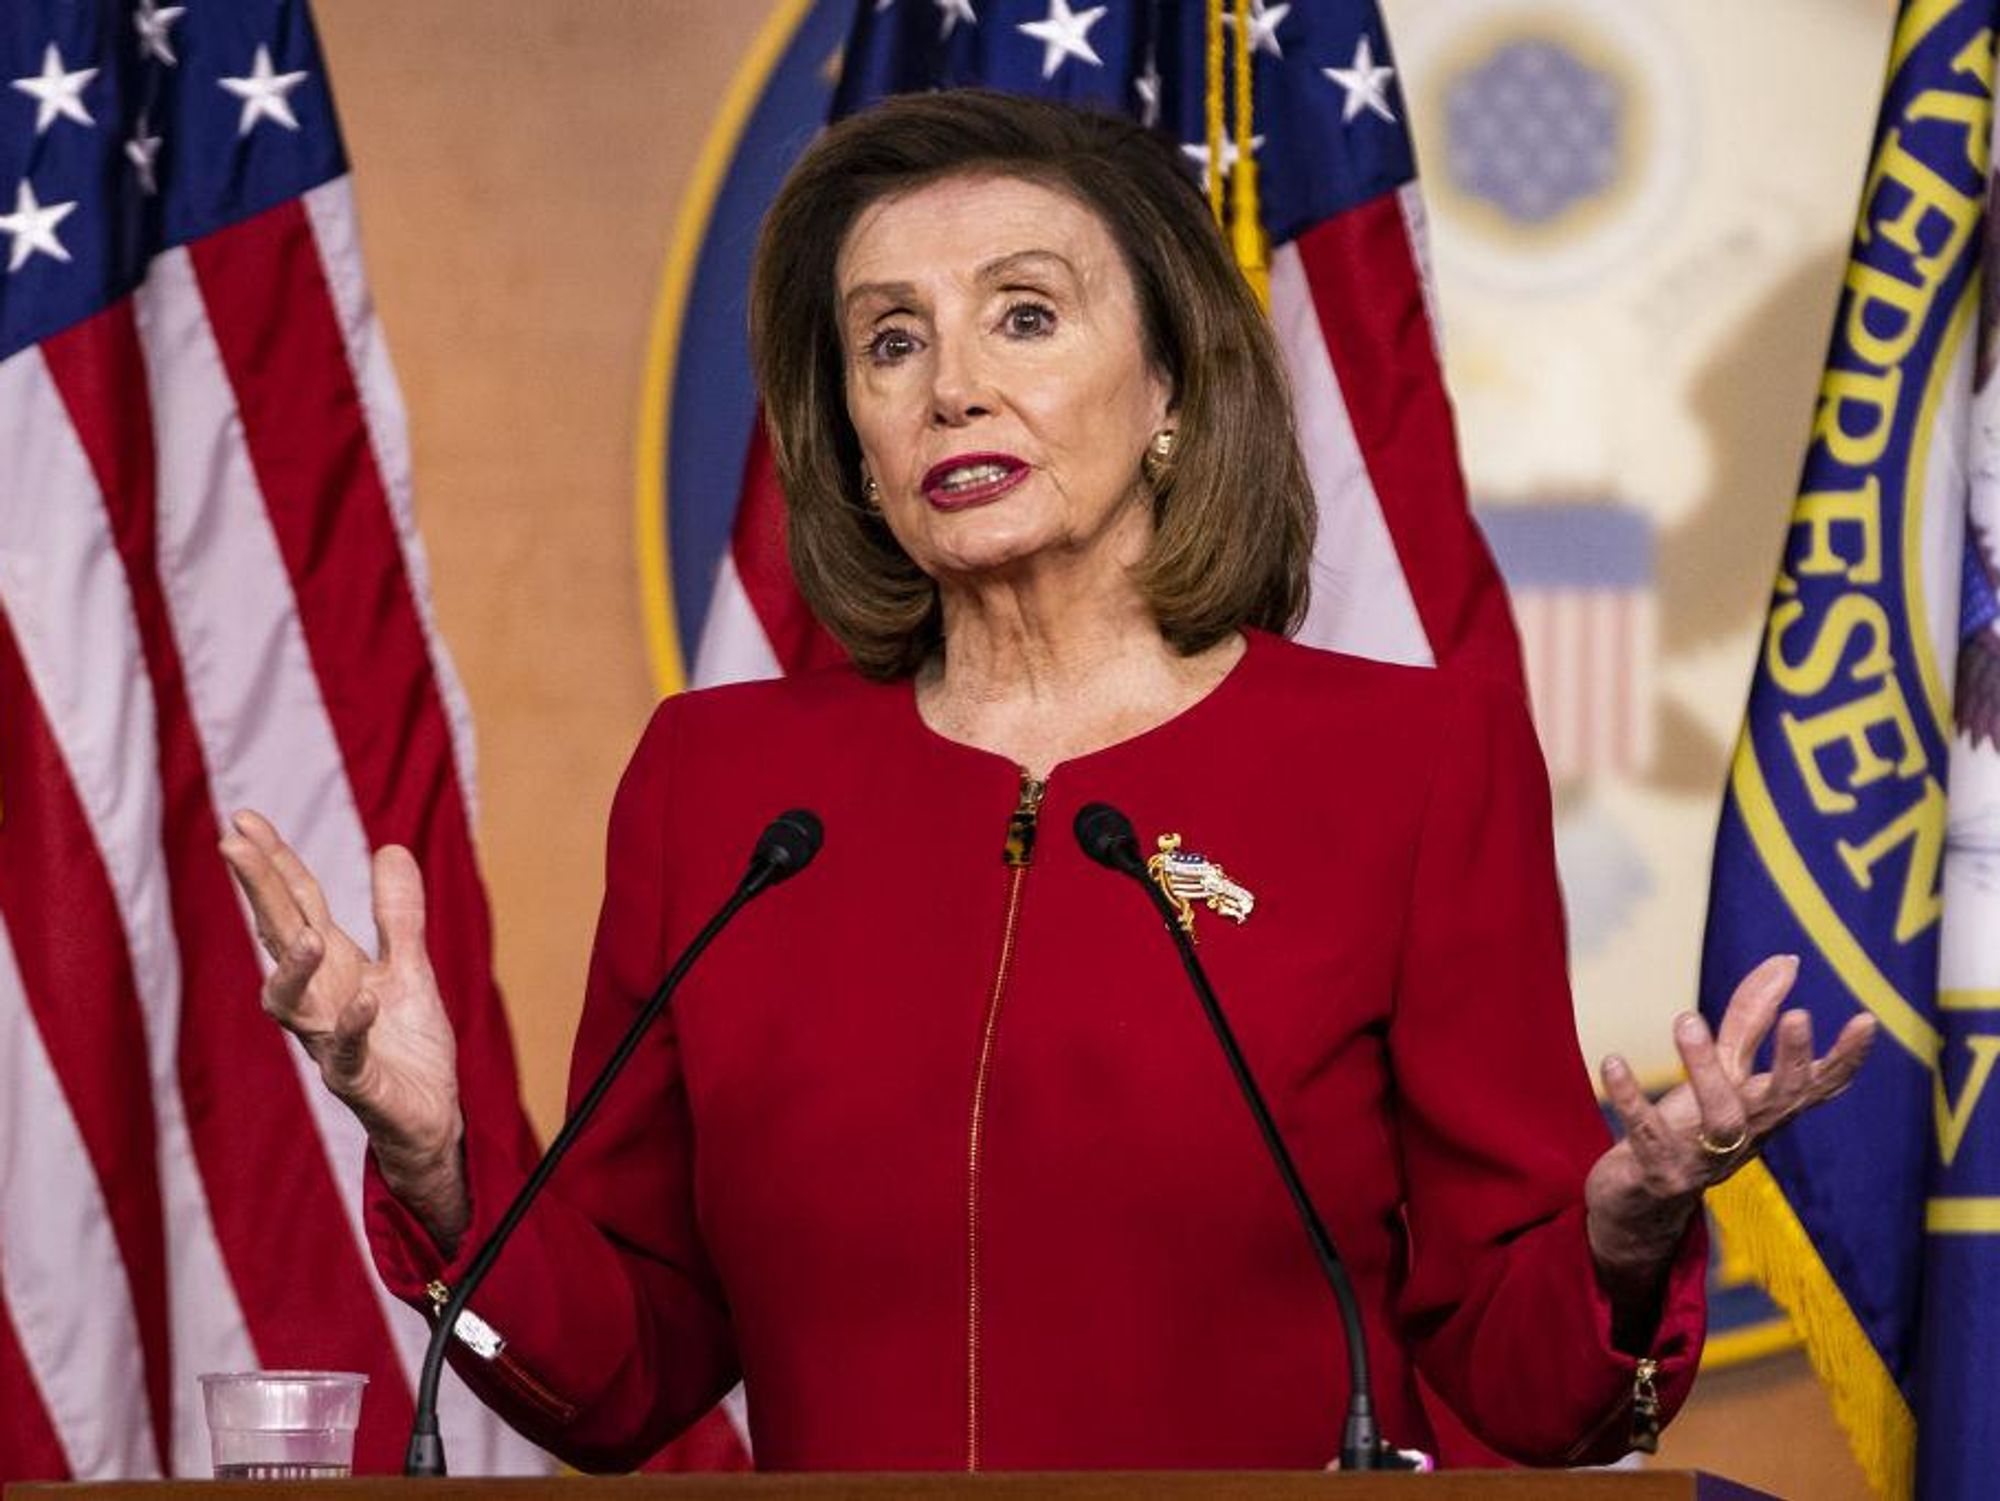 House Speaker Nancy Pelosi says that President Joe Biden 'knows his foreign policy'